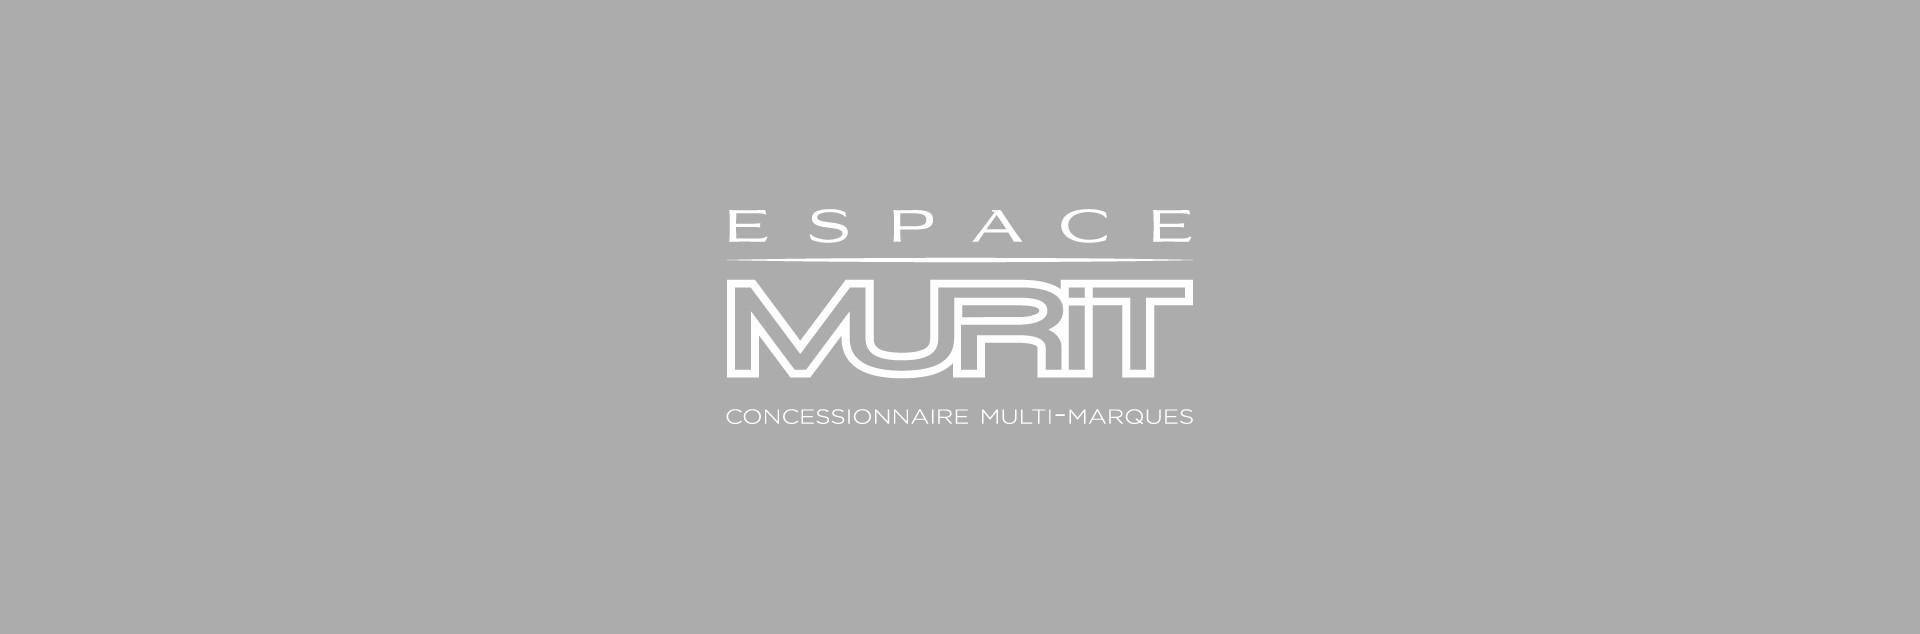 Espace Murit Concessionnaire Multimarques Chatillon